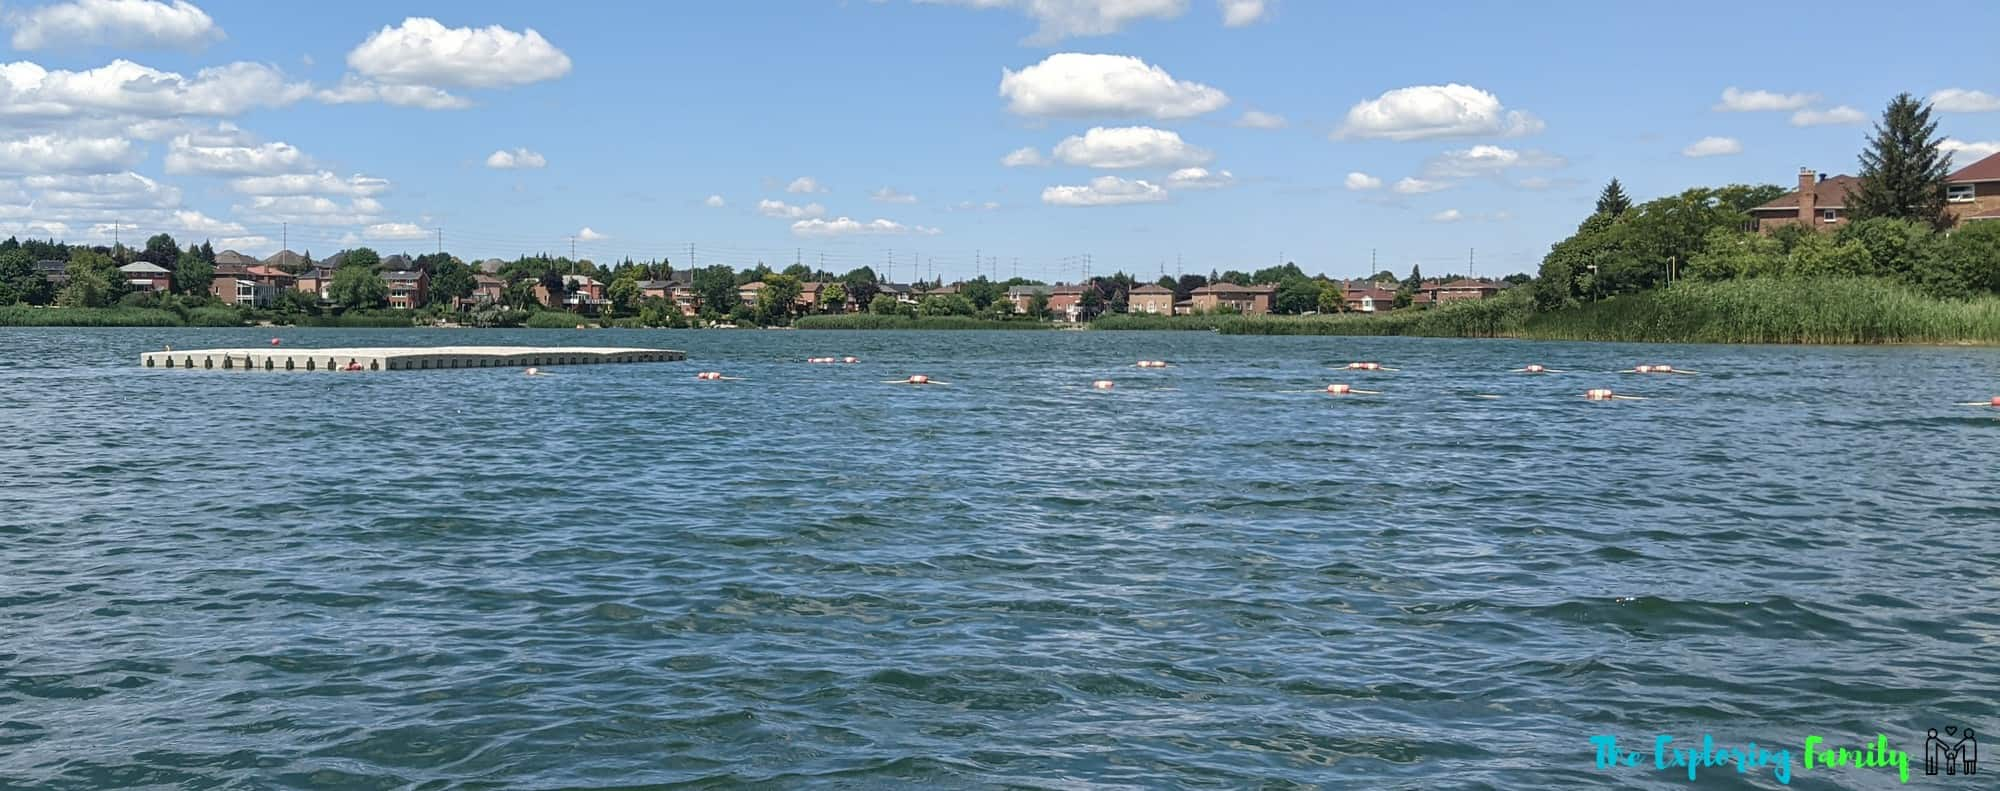 professor's lake brampton beach floating dock